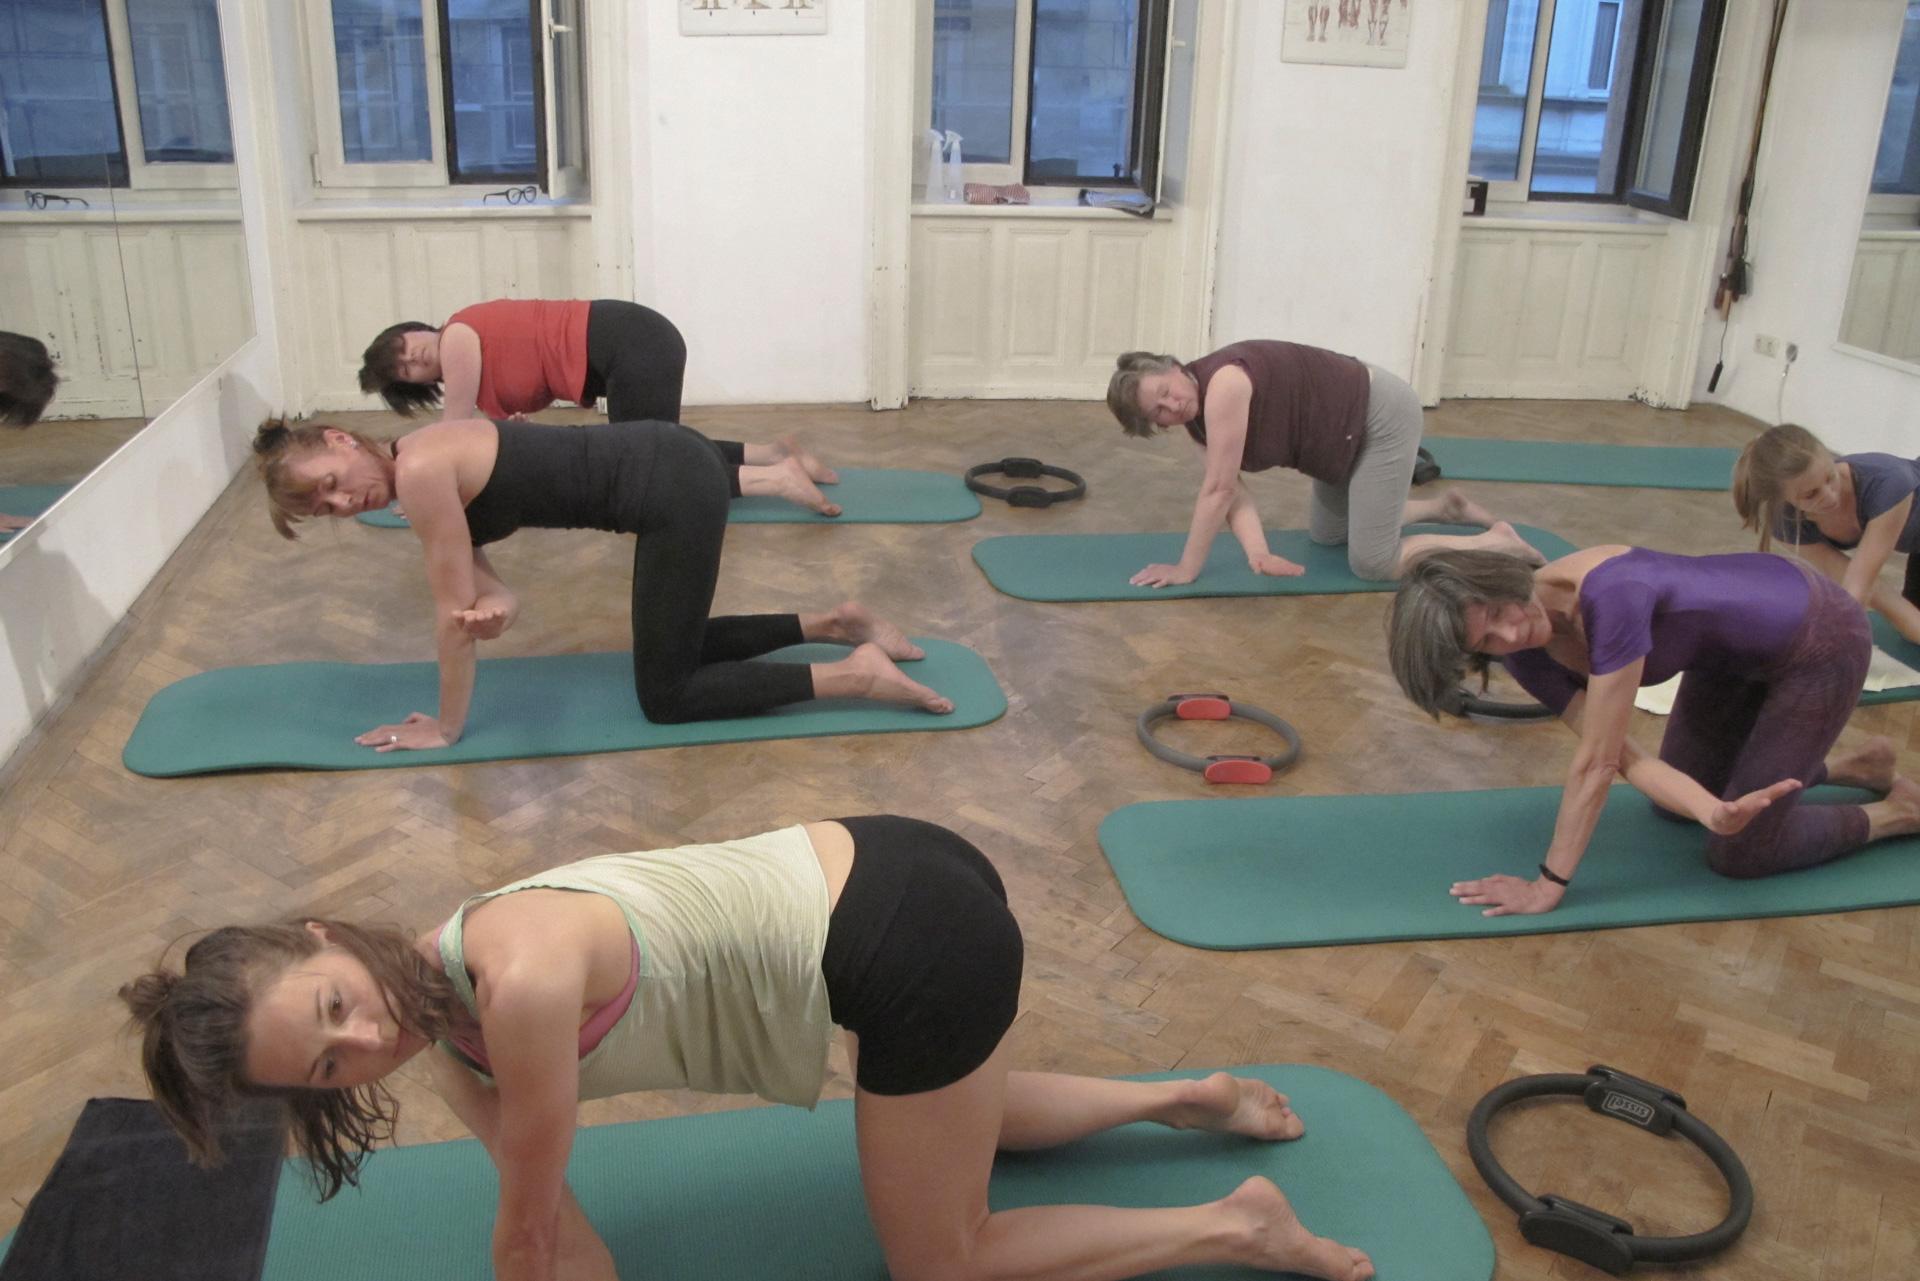 Pilates Thread the Needle Übung Körpertraining Körperarbeit